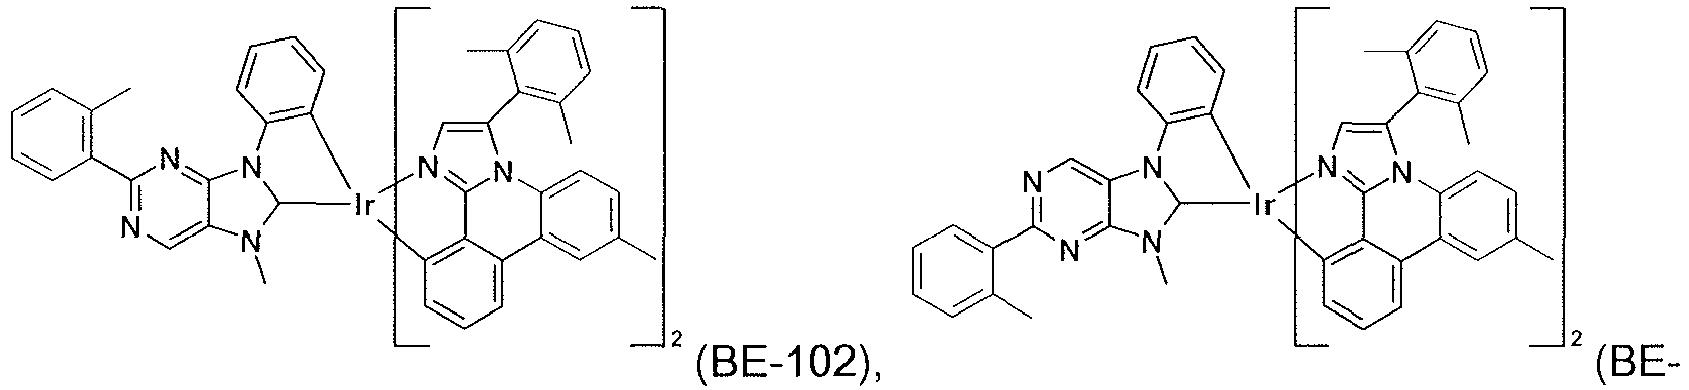 Figure imgb0639